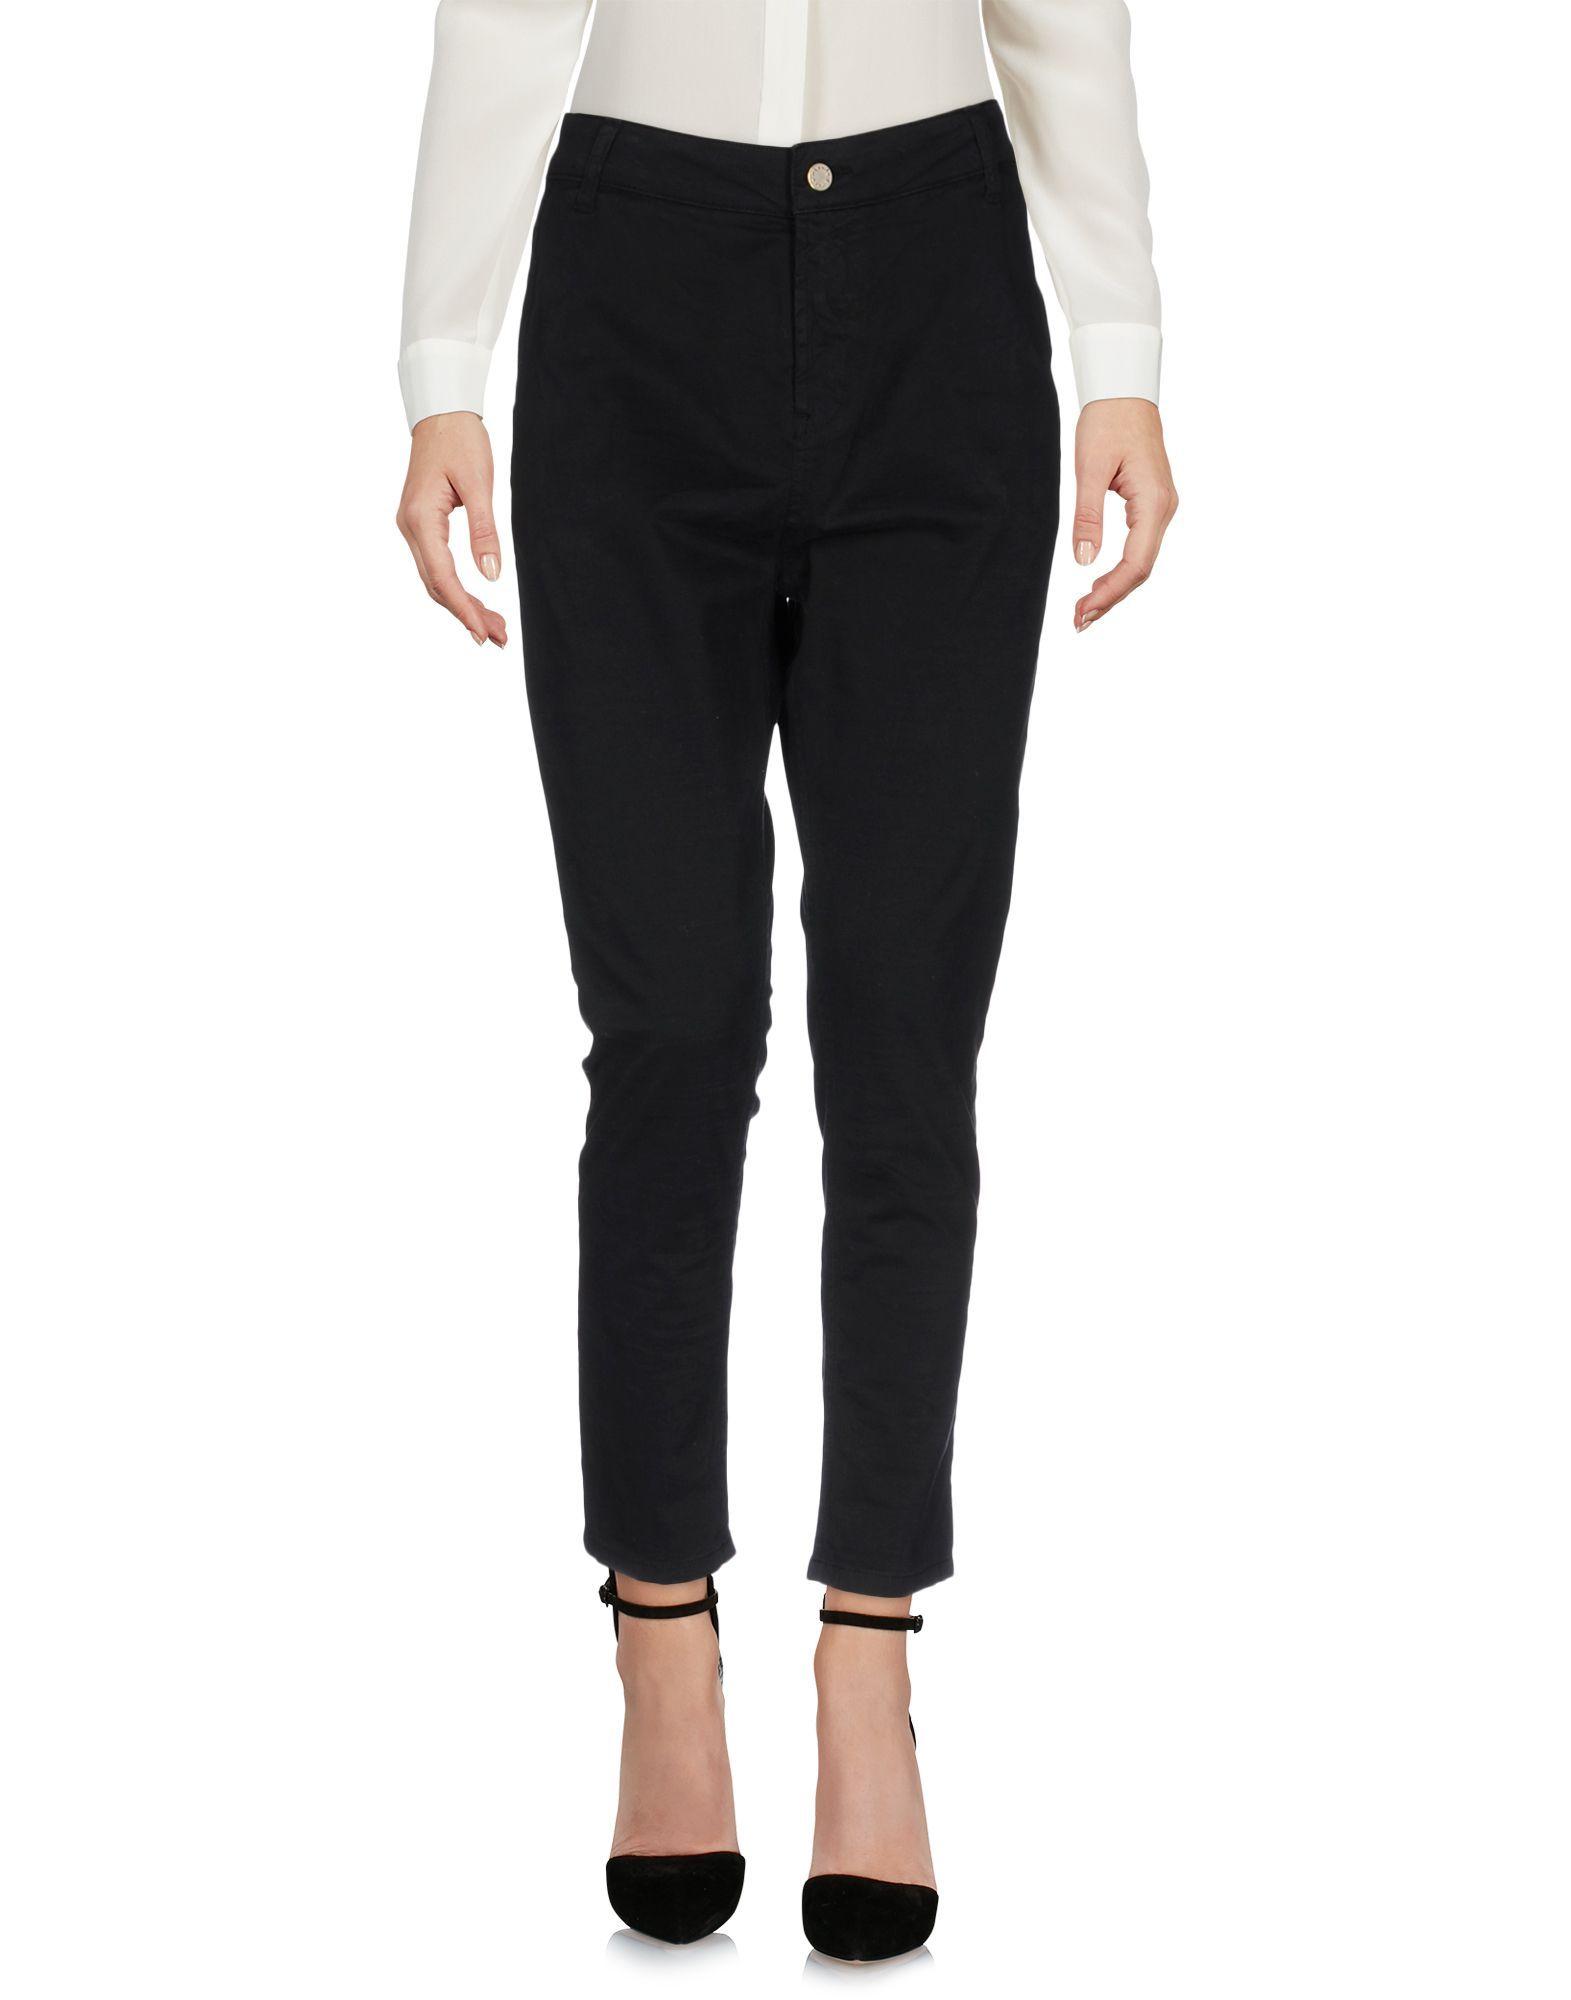 Manila Grace Black Cotton Trousers